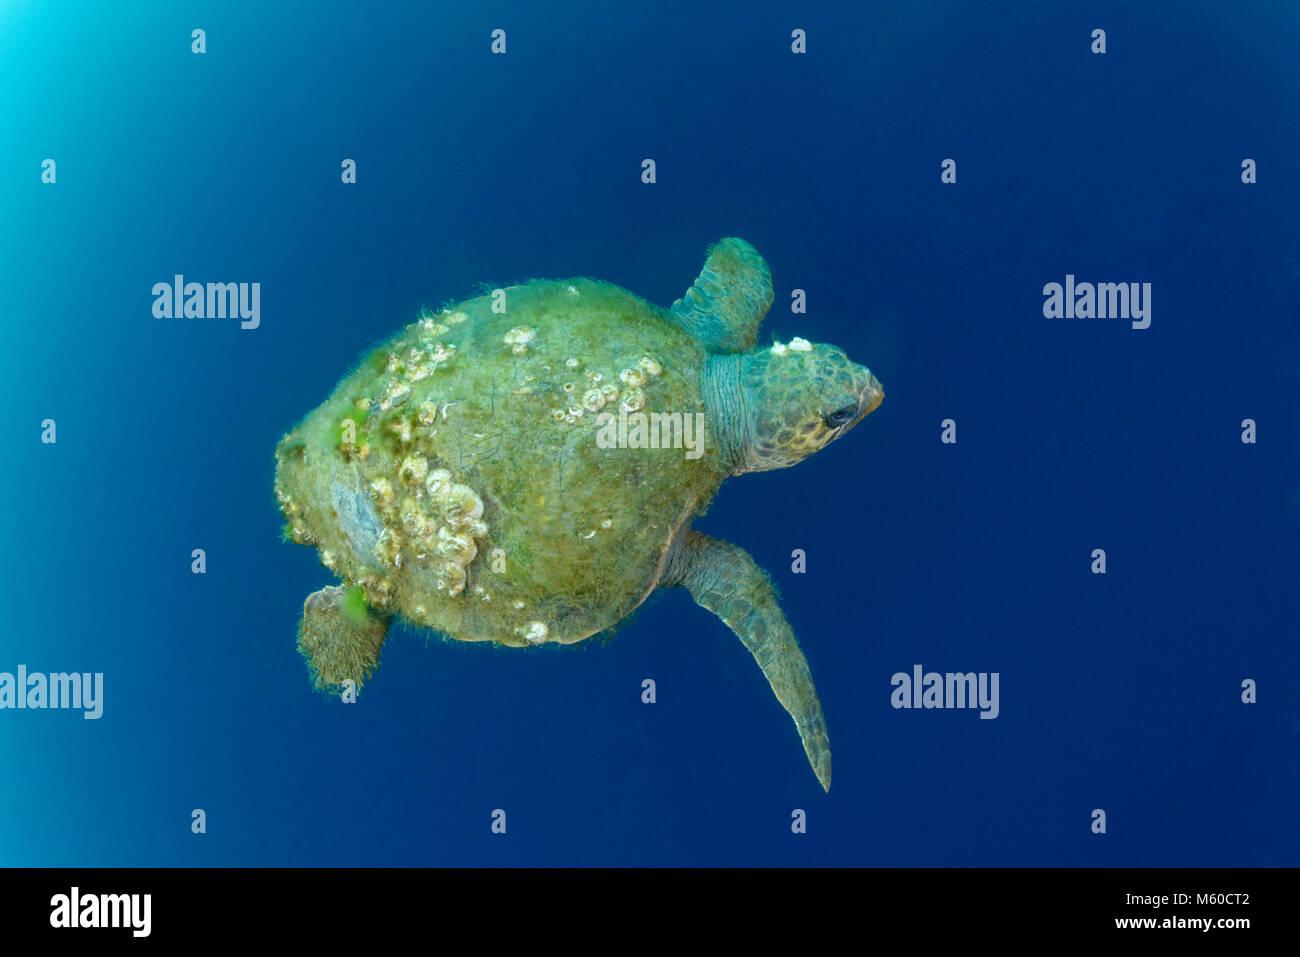 Old Loggerhead Sea turtle with Turtle barnacle. Mediterranean Sea, Croatia, Rovinj, Istria, Croatia - Stock Image